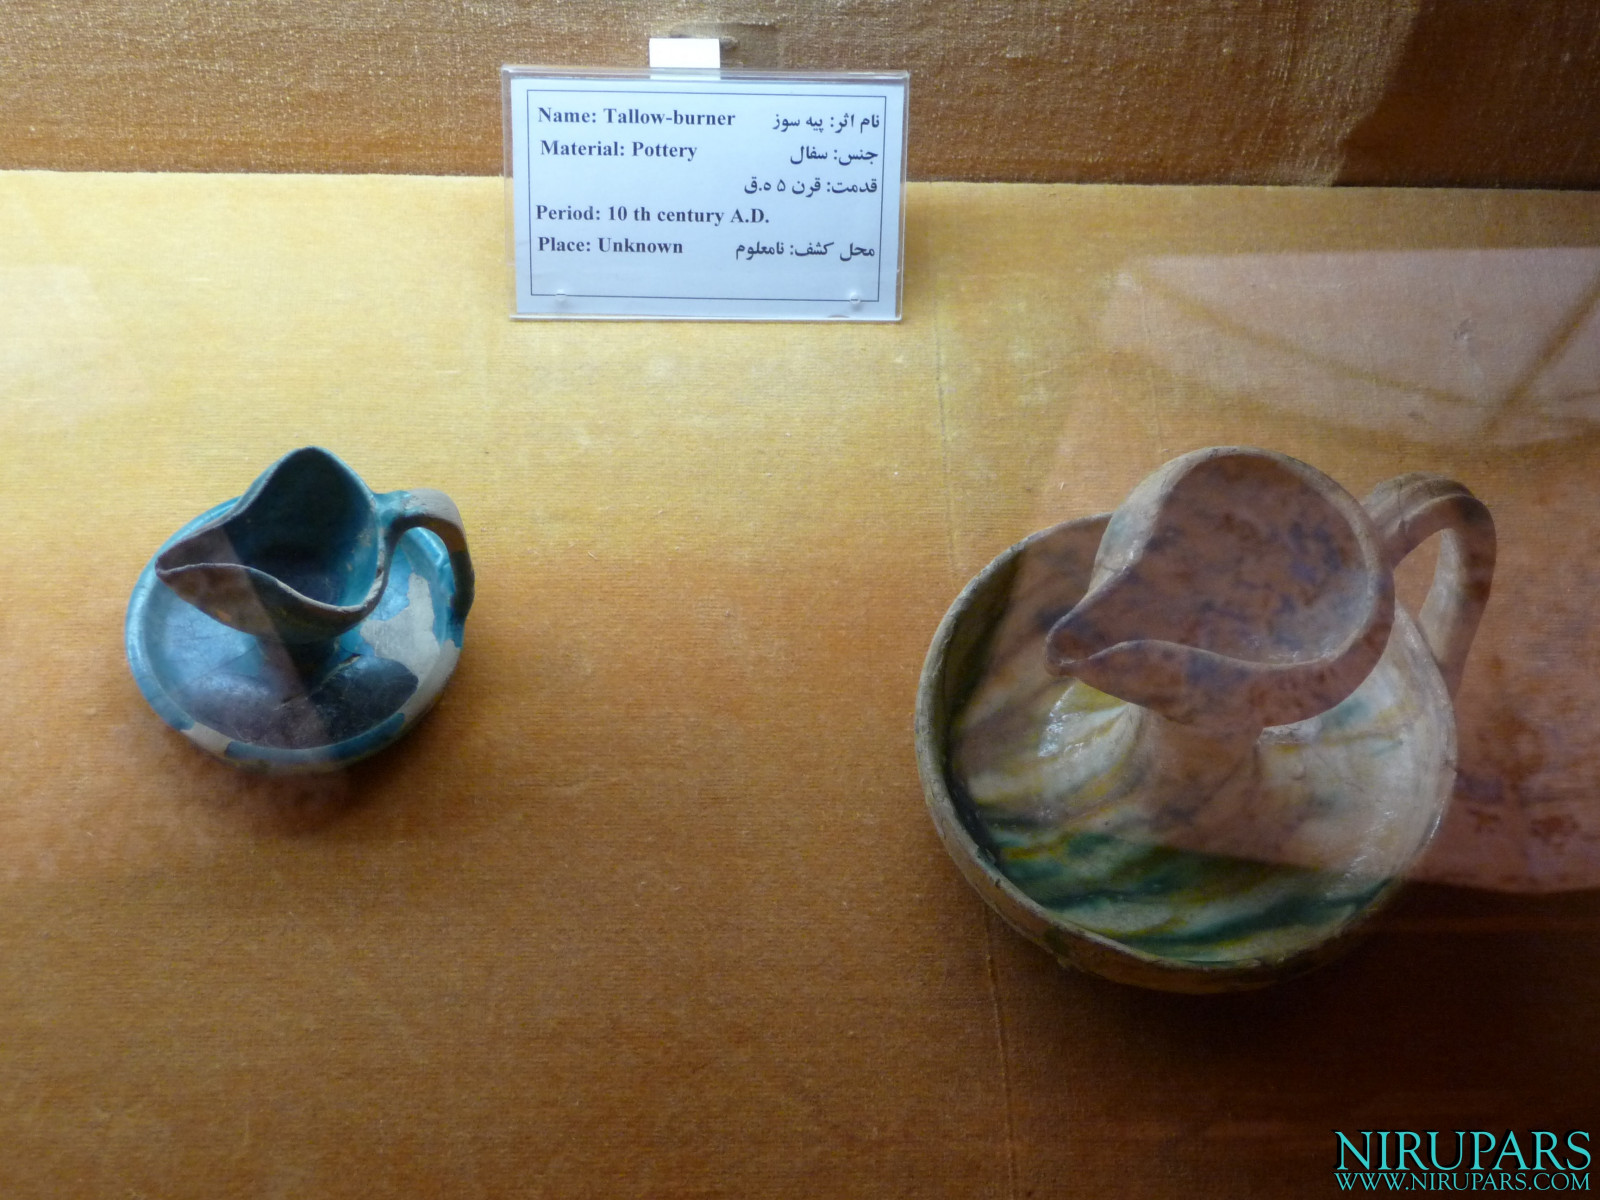 Chehel Sotun - Museum - Pottery